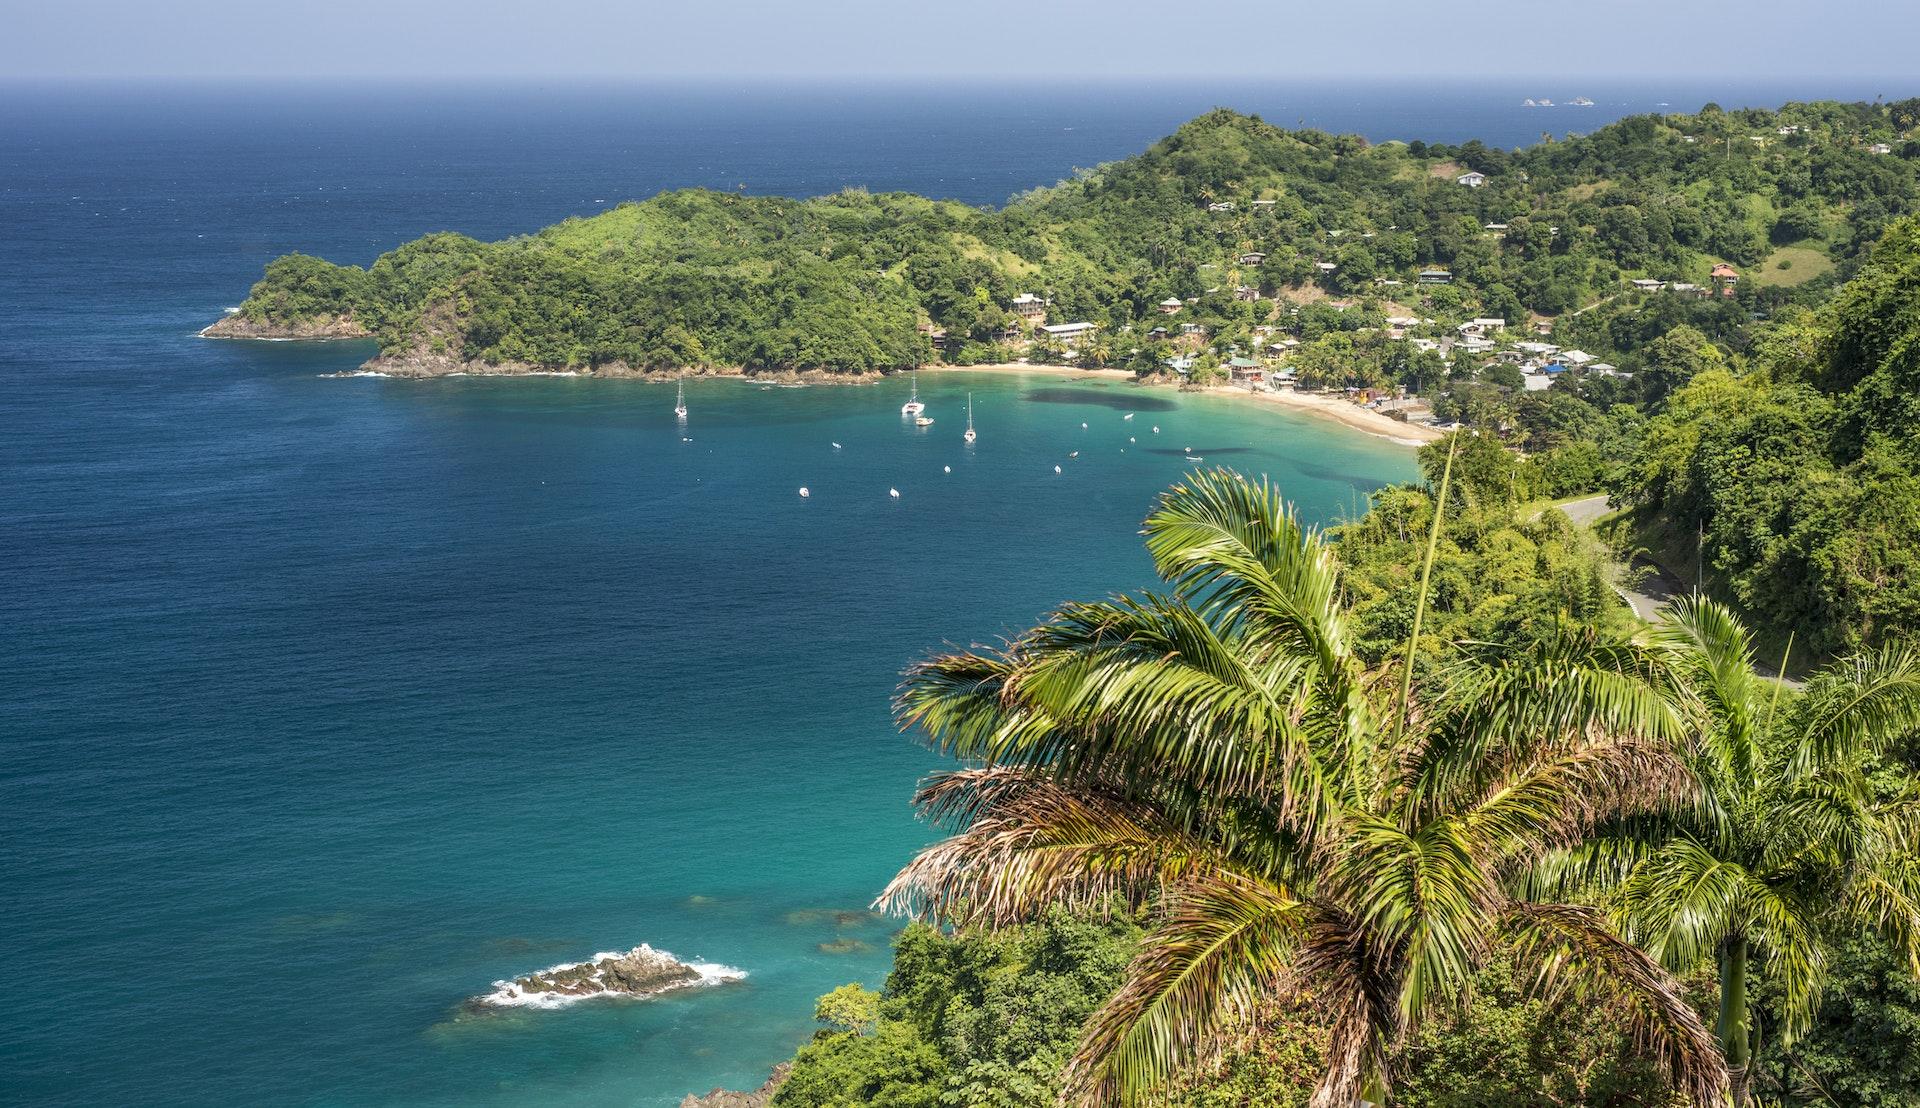 Castara Bay, Tobago © pabst_ell, Getty Images